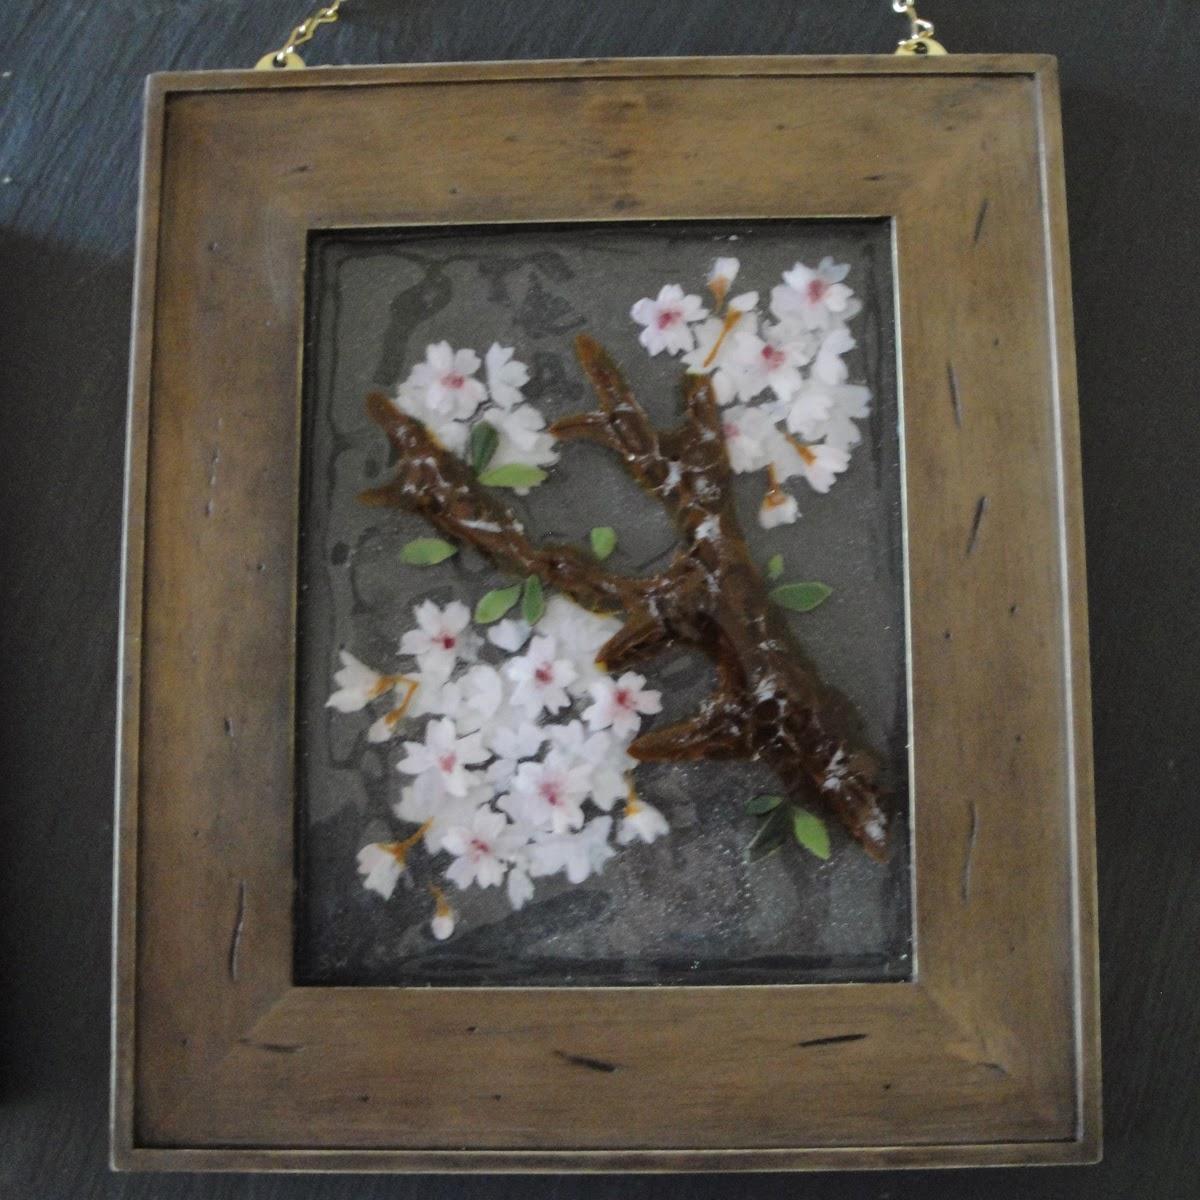 fused stained glass sakura cherry blossom bloom flower flowers petals pink blooms flutterbyfoto flutterbybutterfly etsy